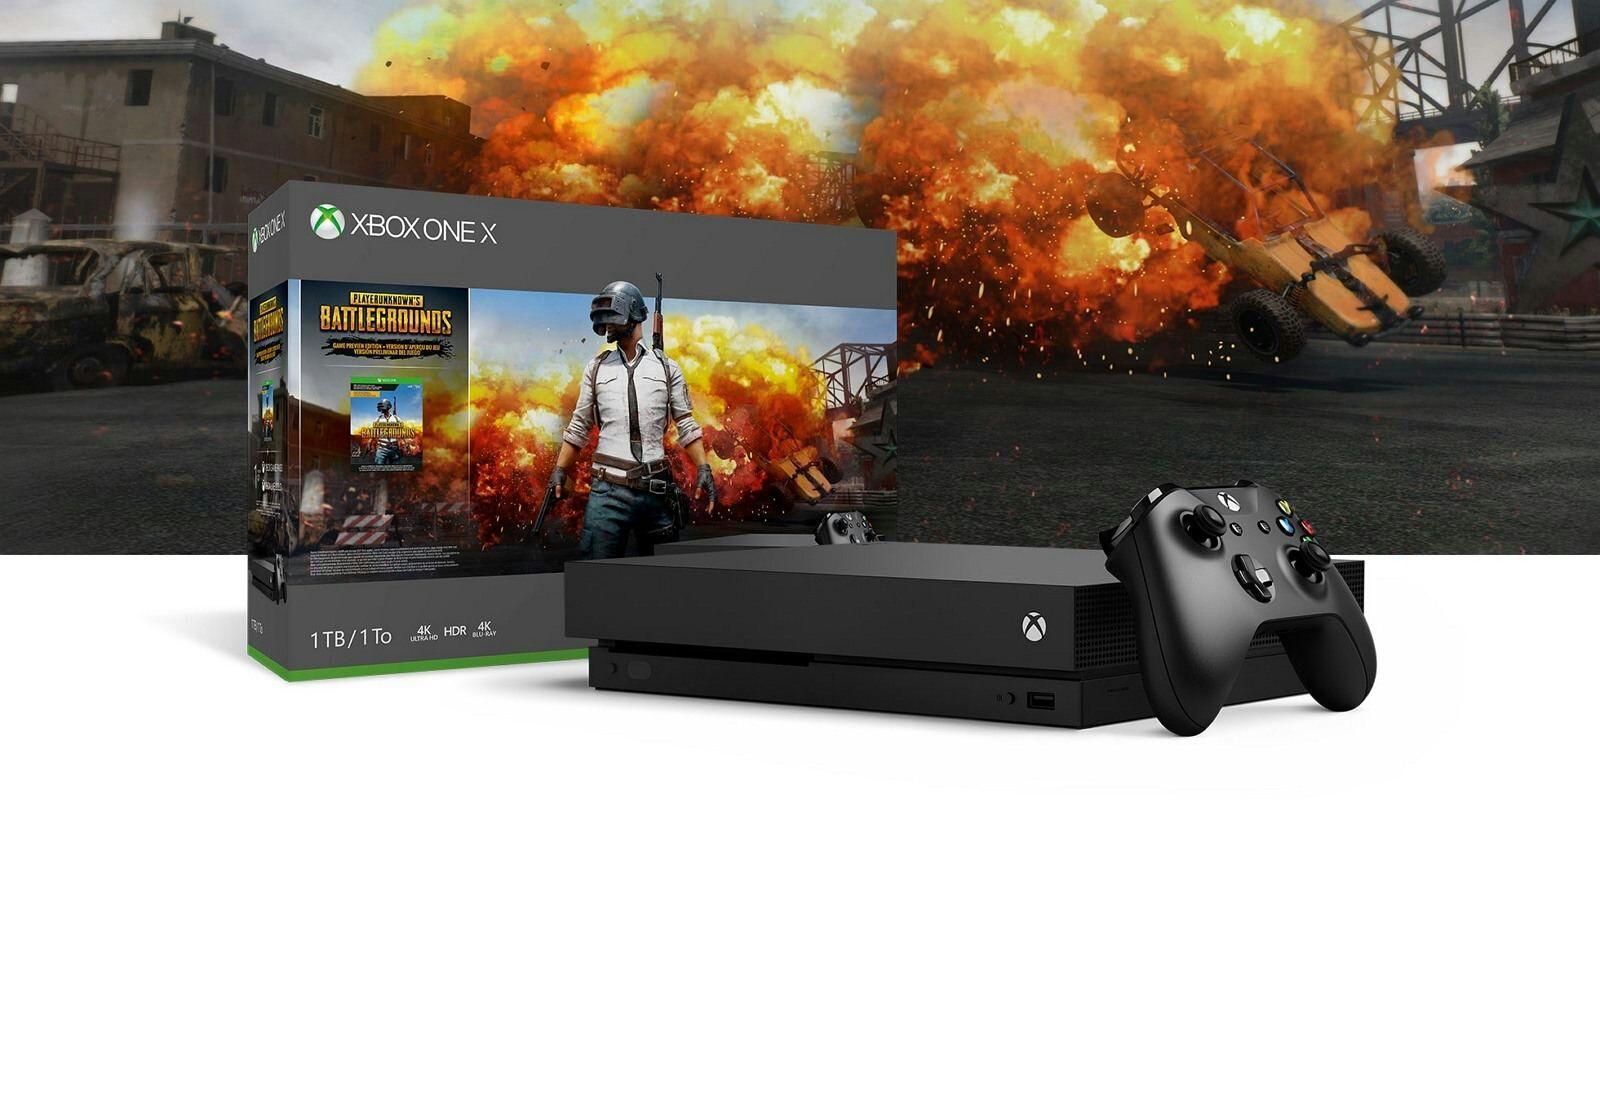 Preciazos Black friday (Importar desde USA). Xbox, Nintendo, etc...